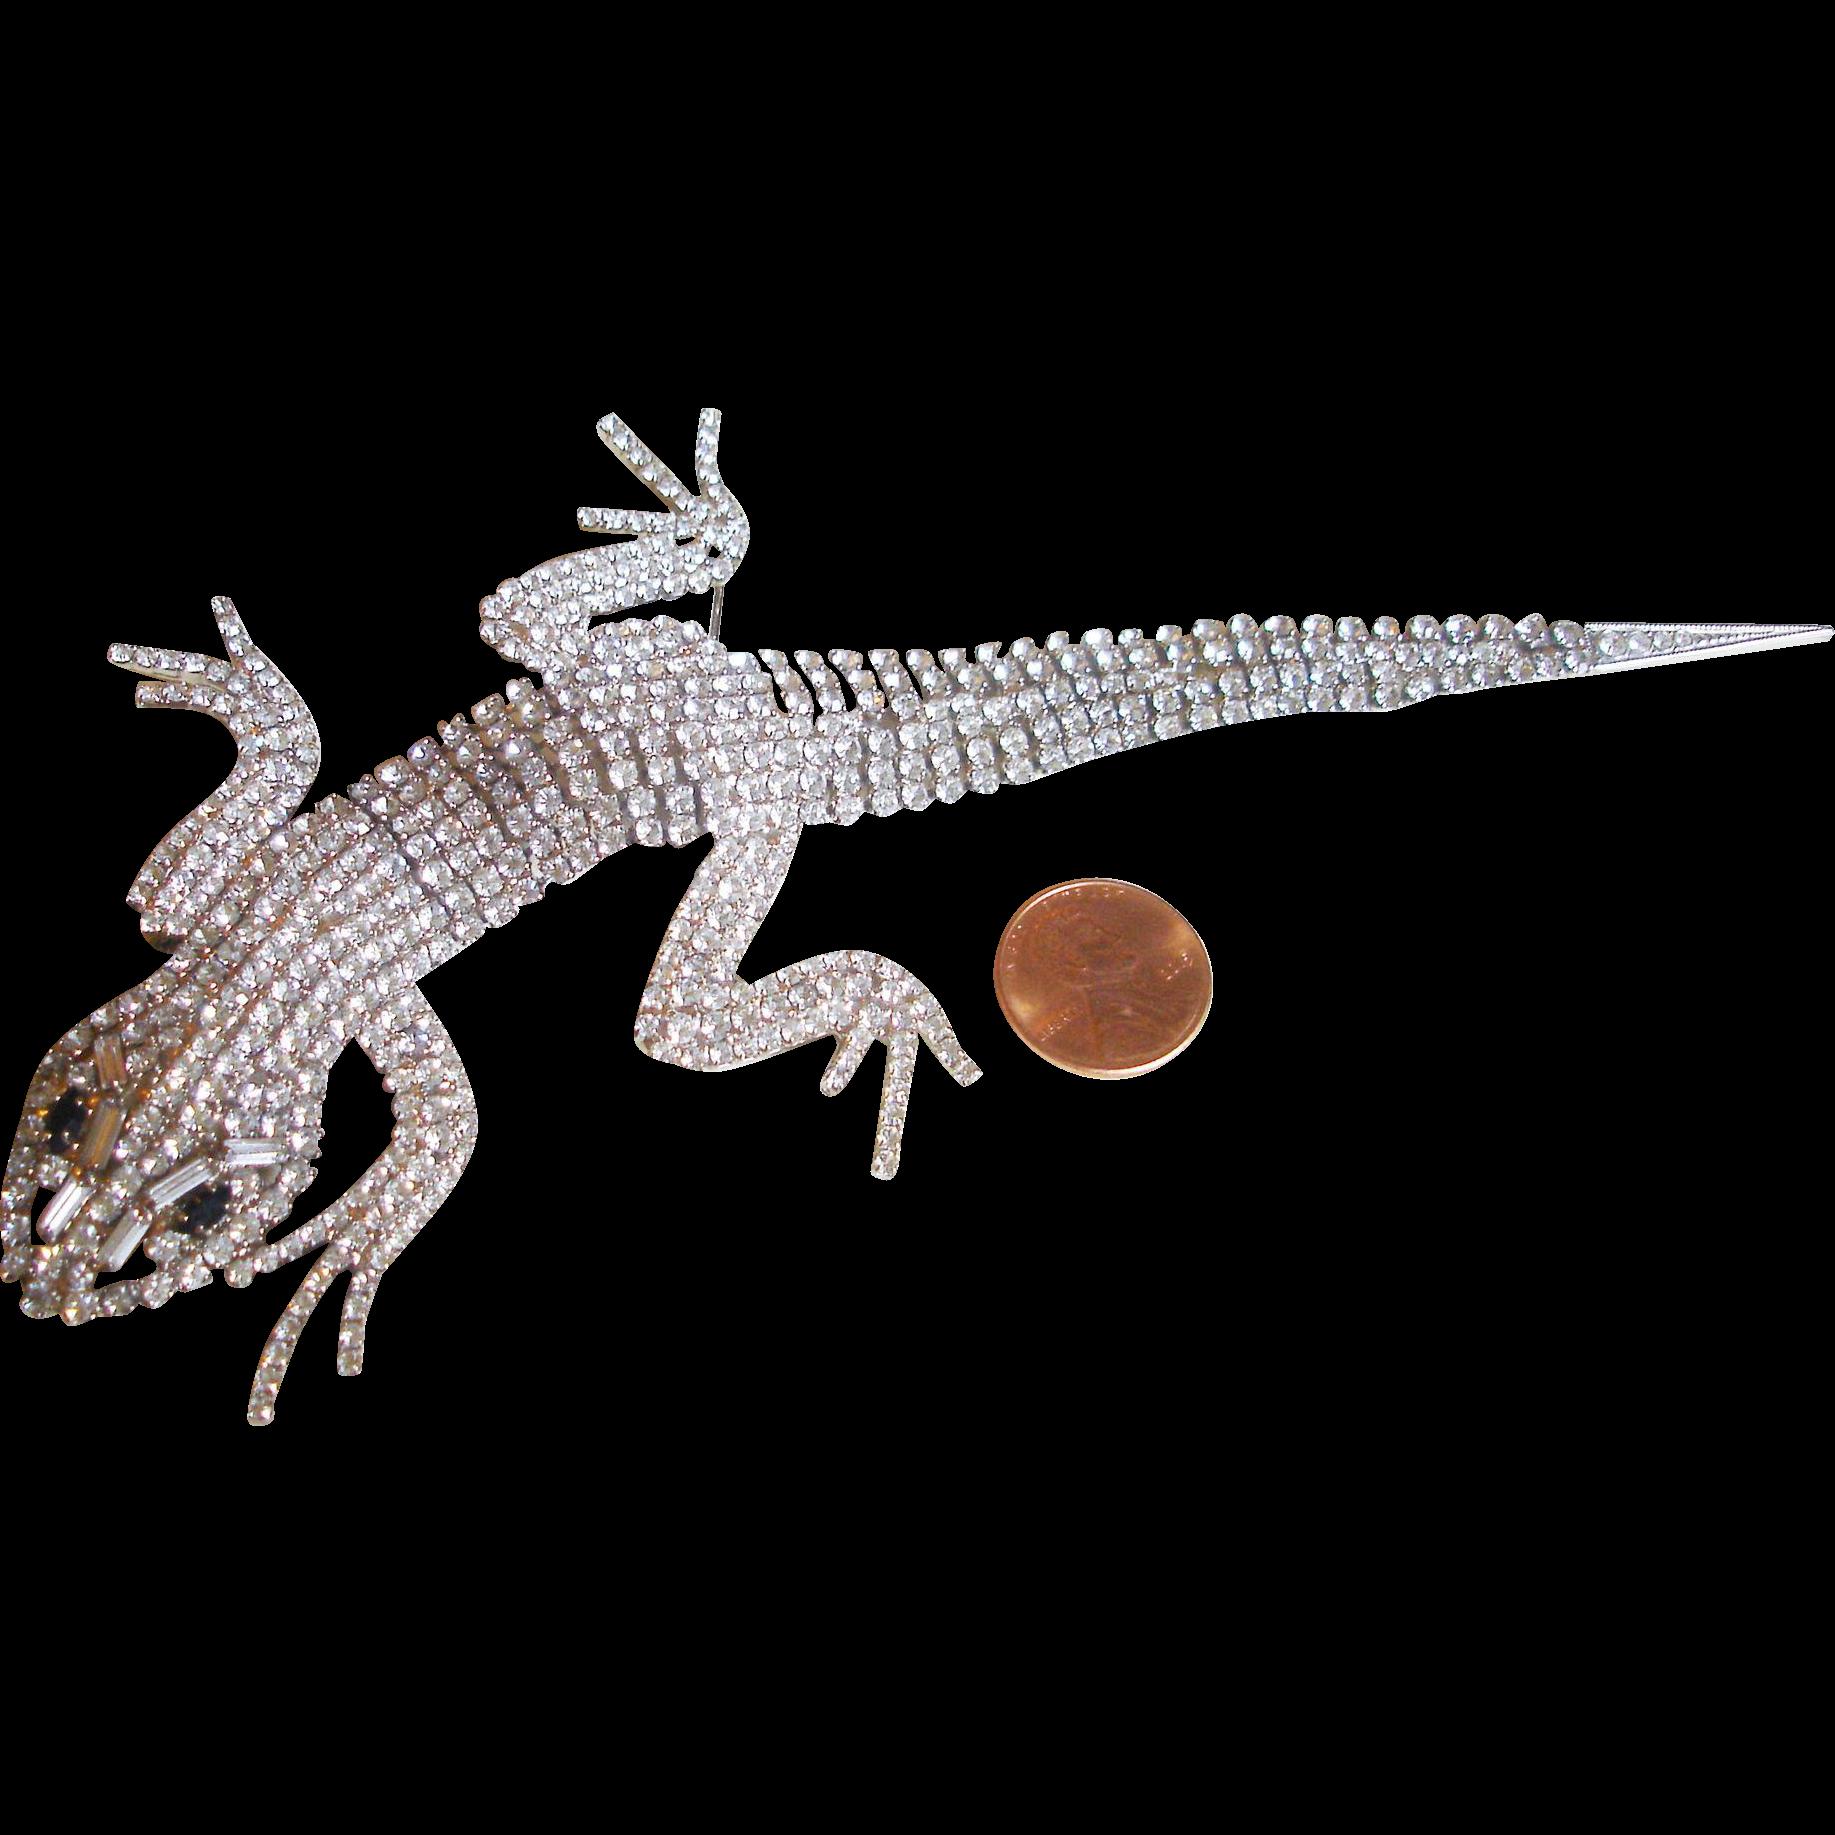 Butler & Wilson Articulated Lizard Crystal Brooch, circa 1980's